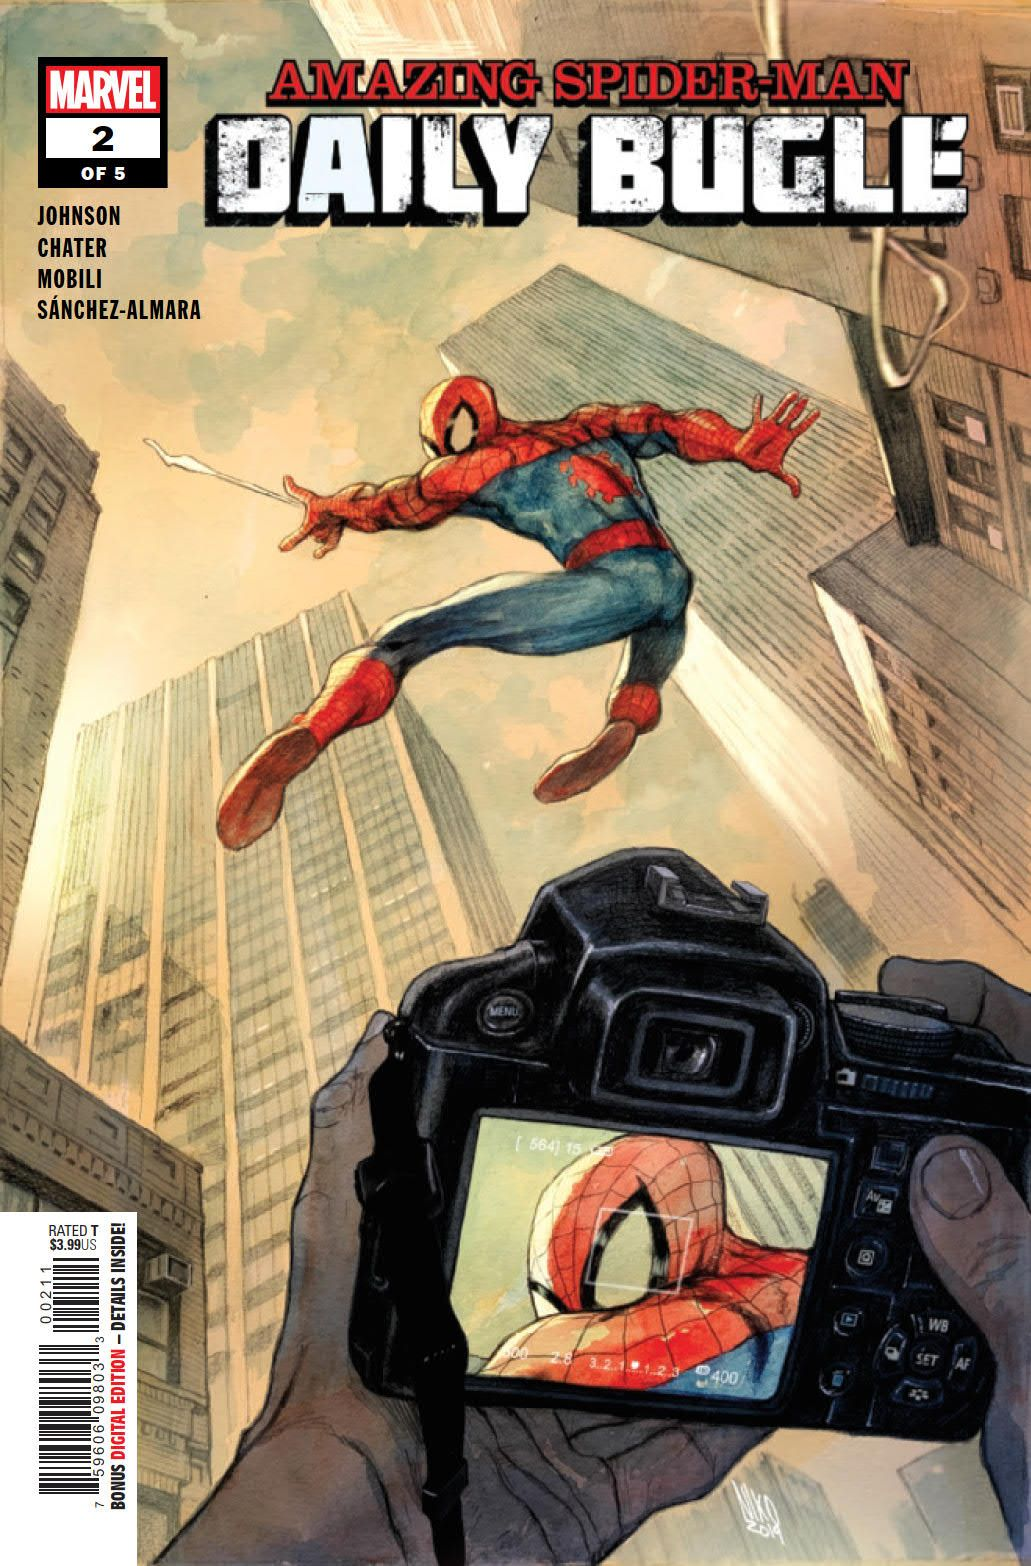 Amazing Spider-Man: Daily Bugle #2 | CBR